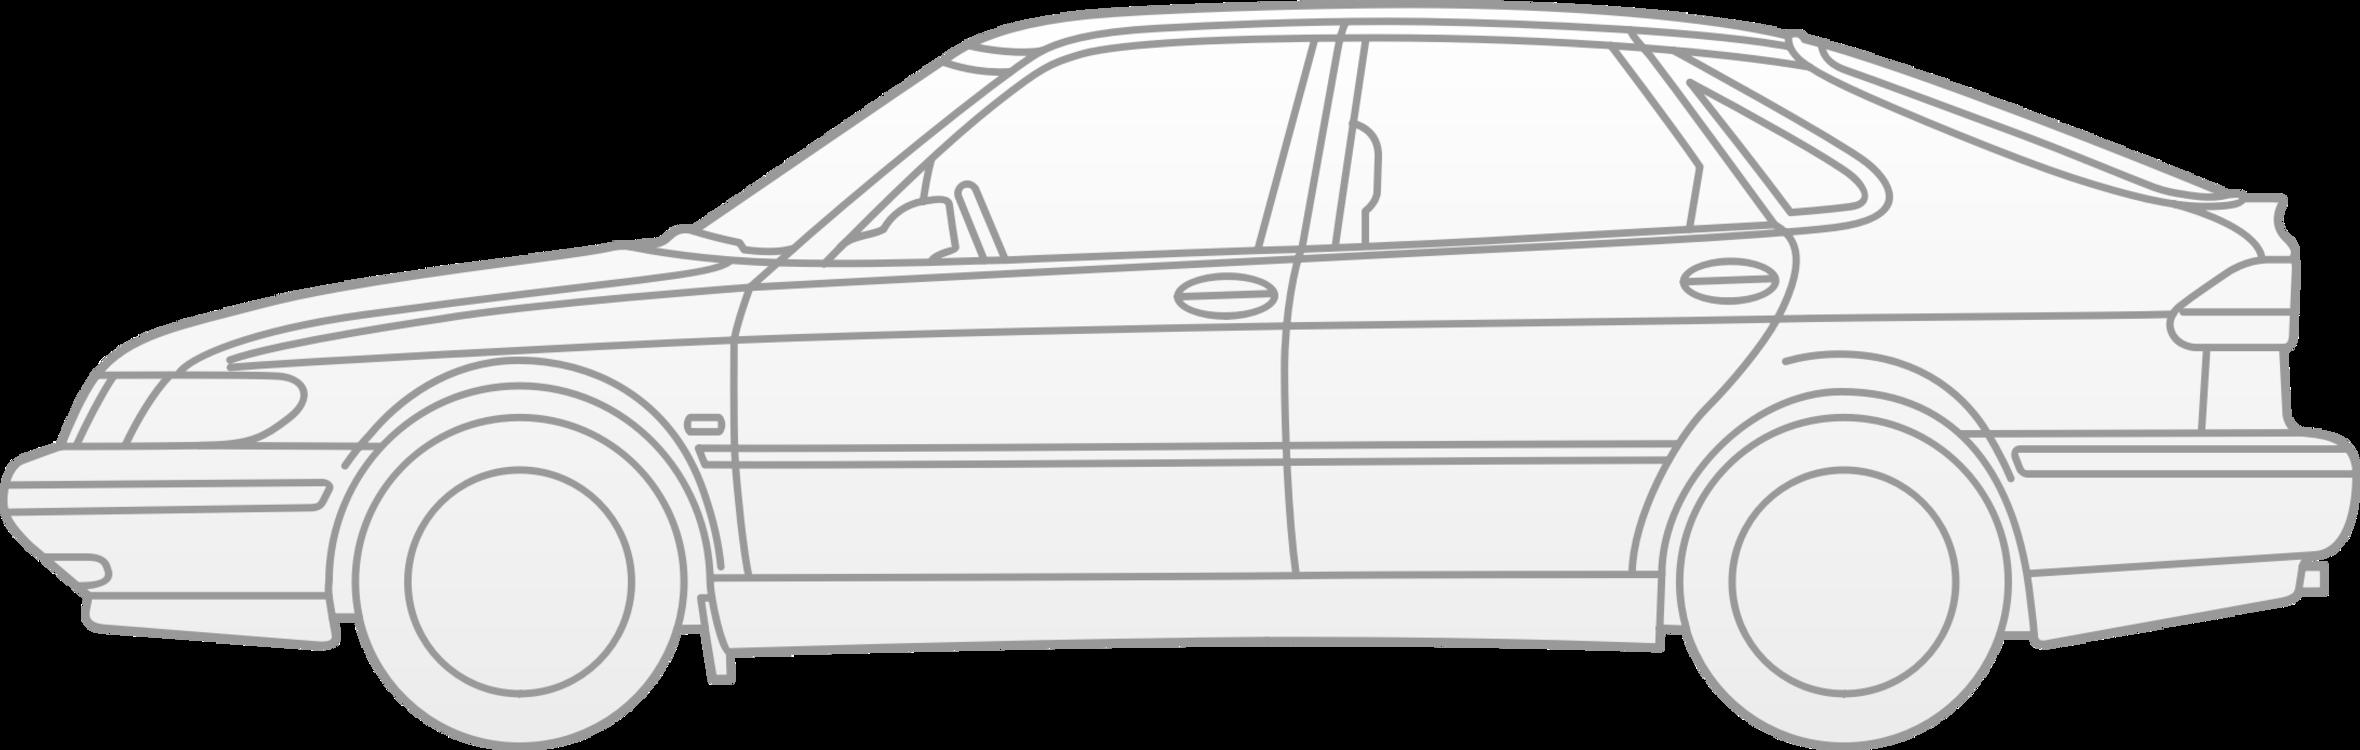 Model Car,Monochrome,Mode Of Transport Clipart.